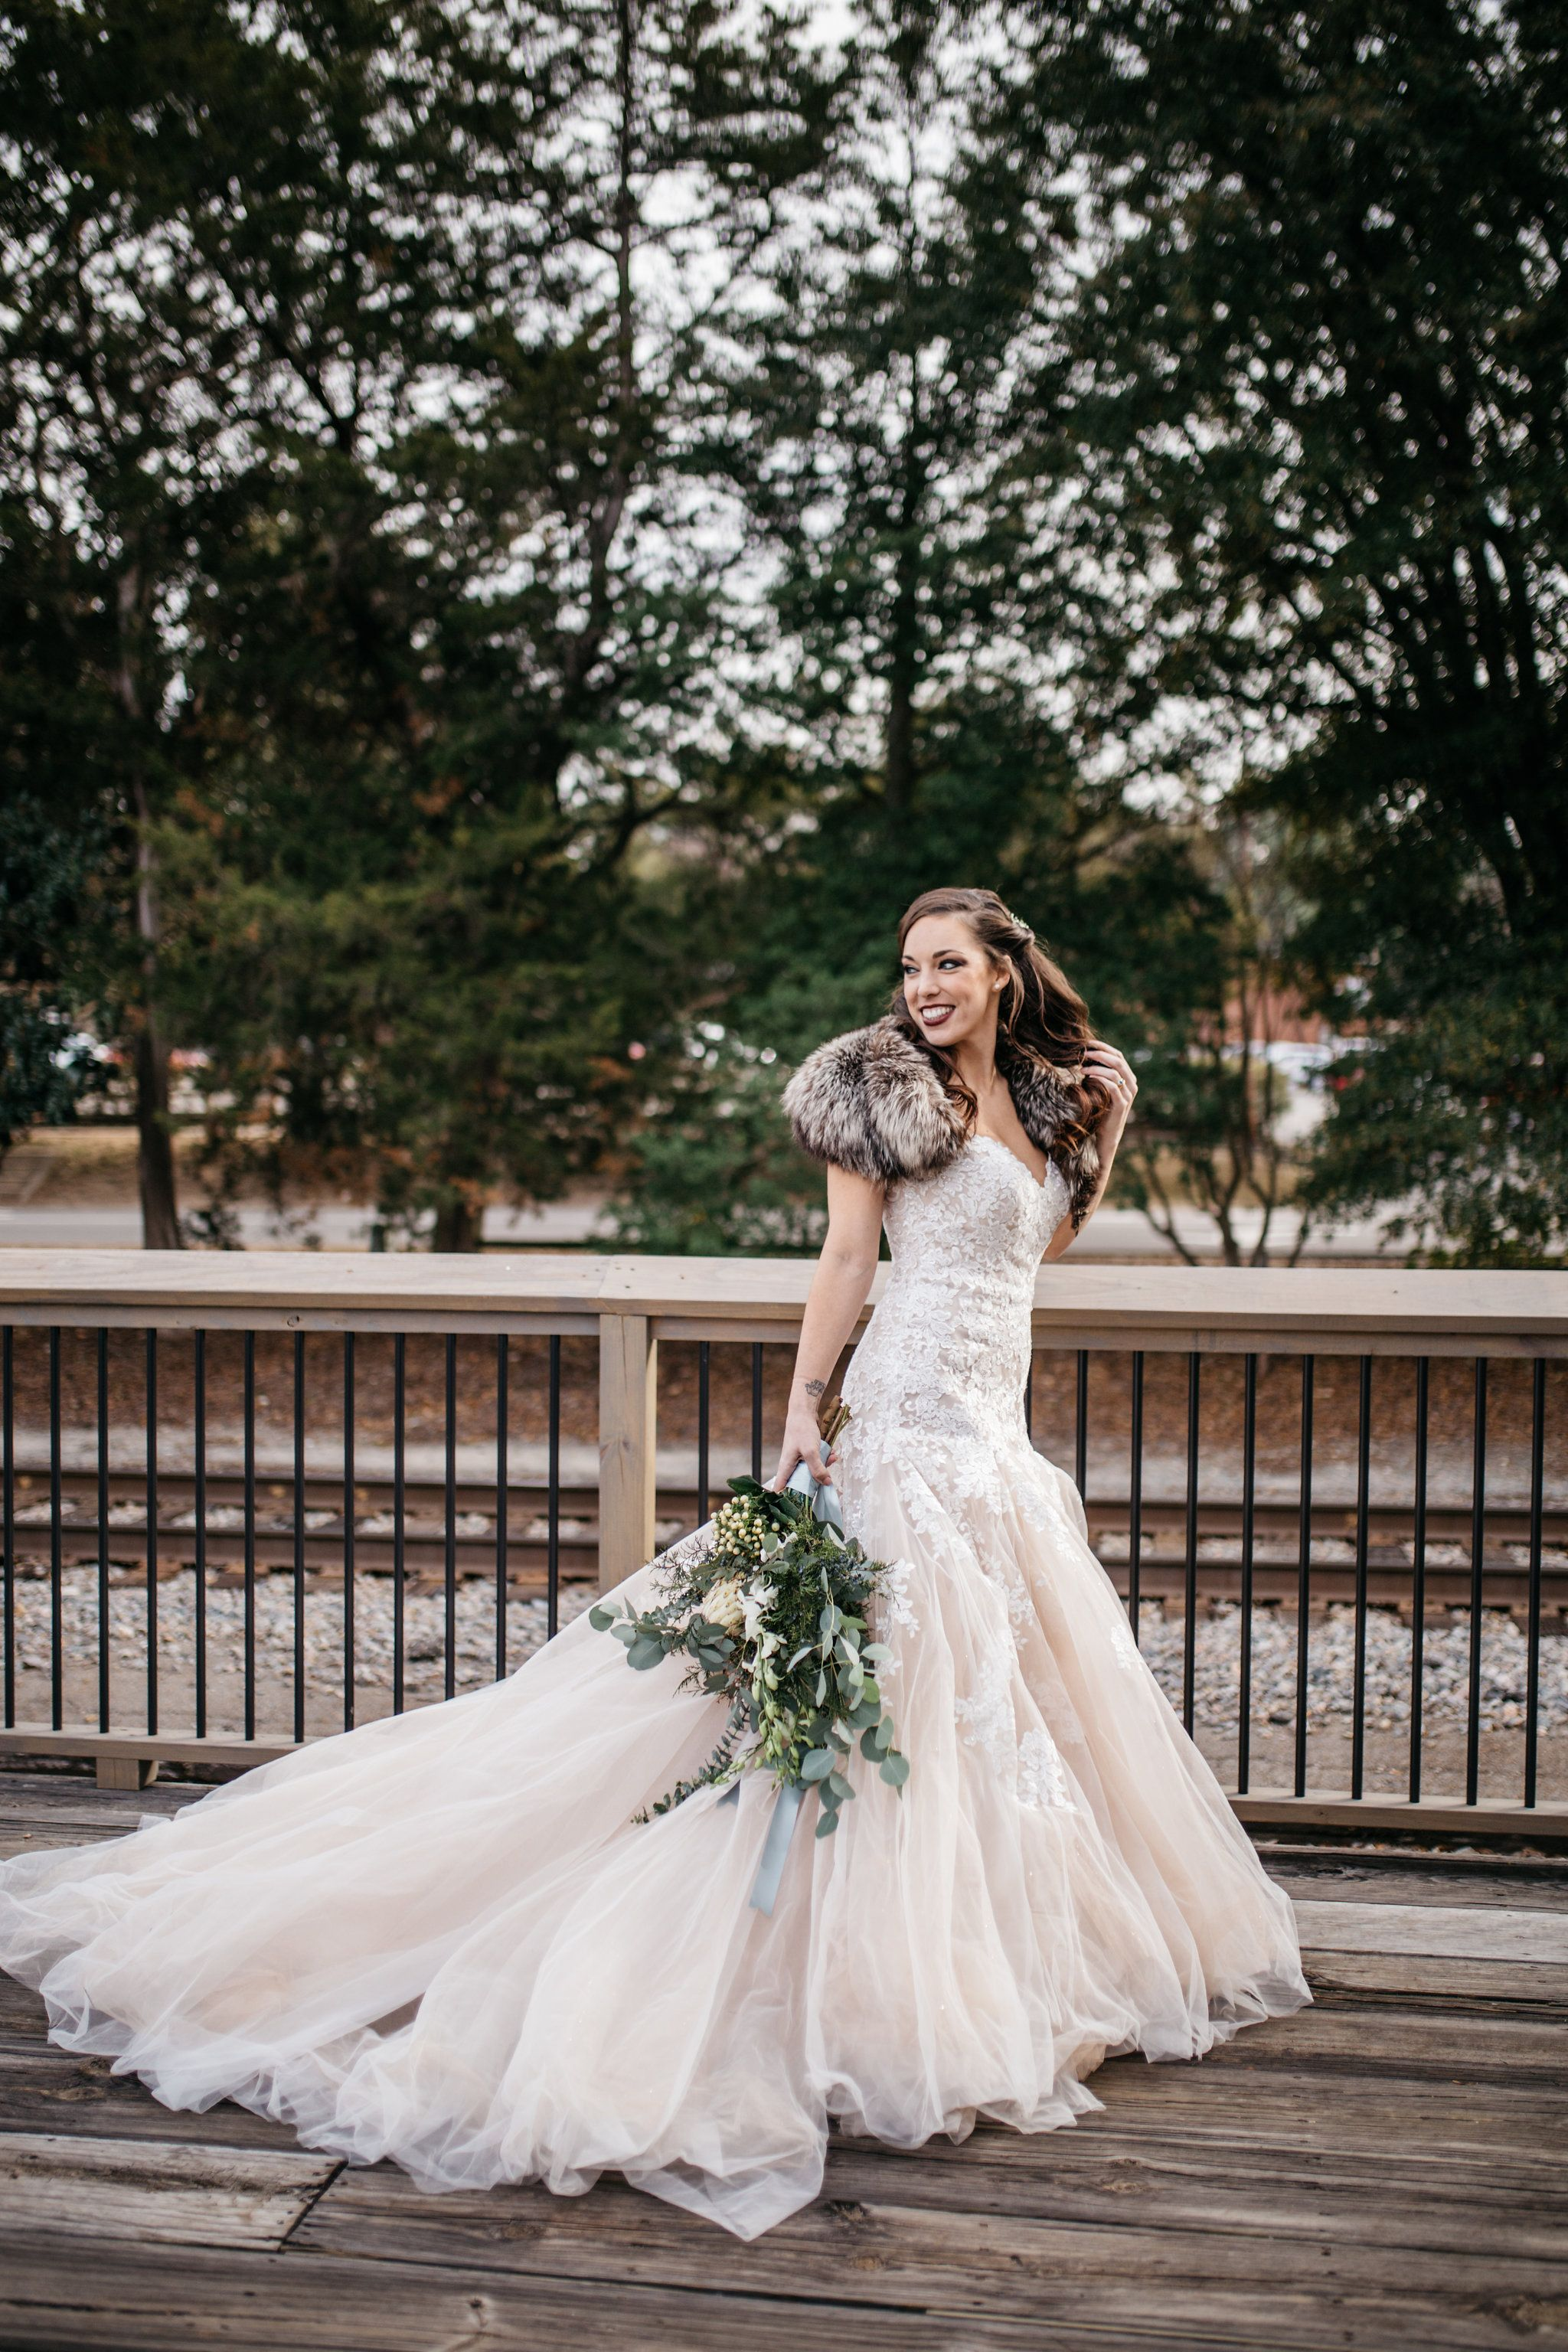 Nordic Winter Inspiration Shoot In 2020 Nordic Wedding Bohemian